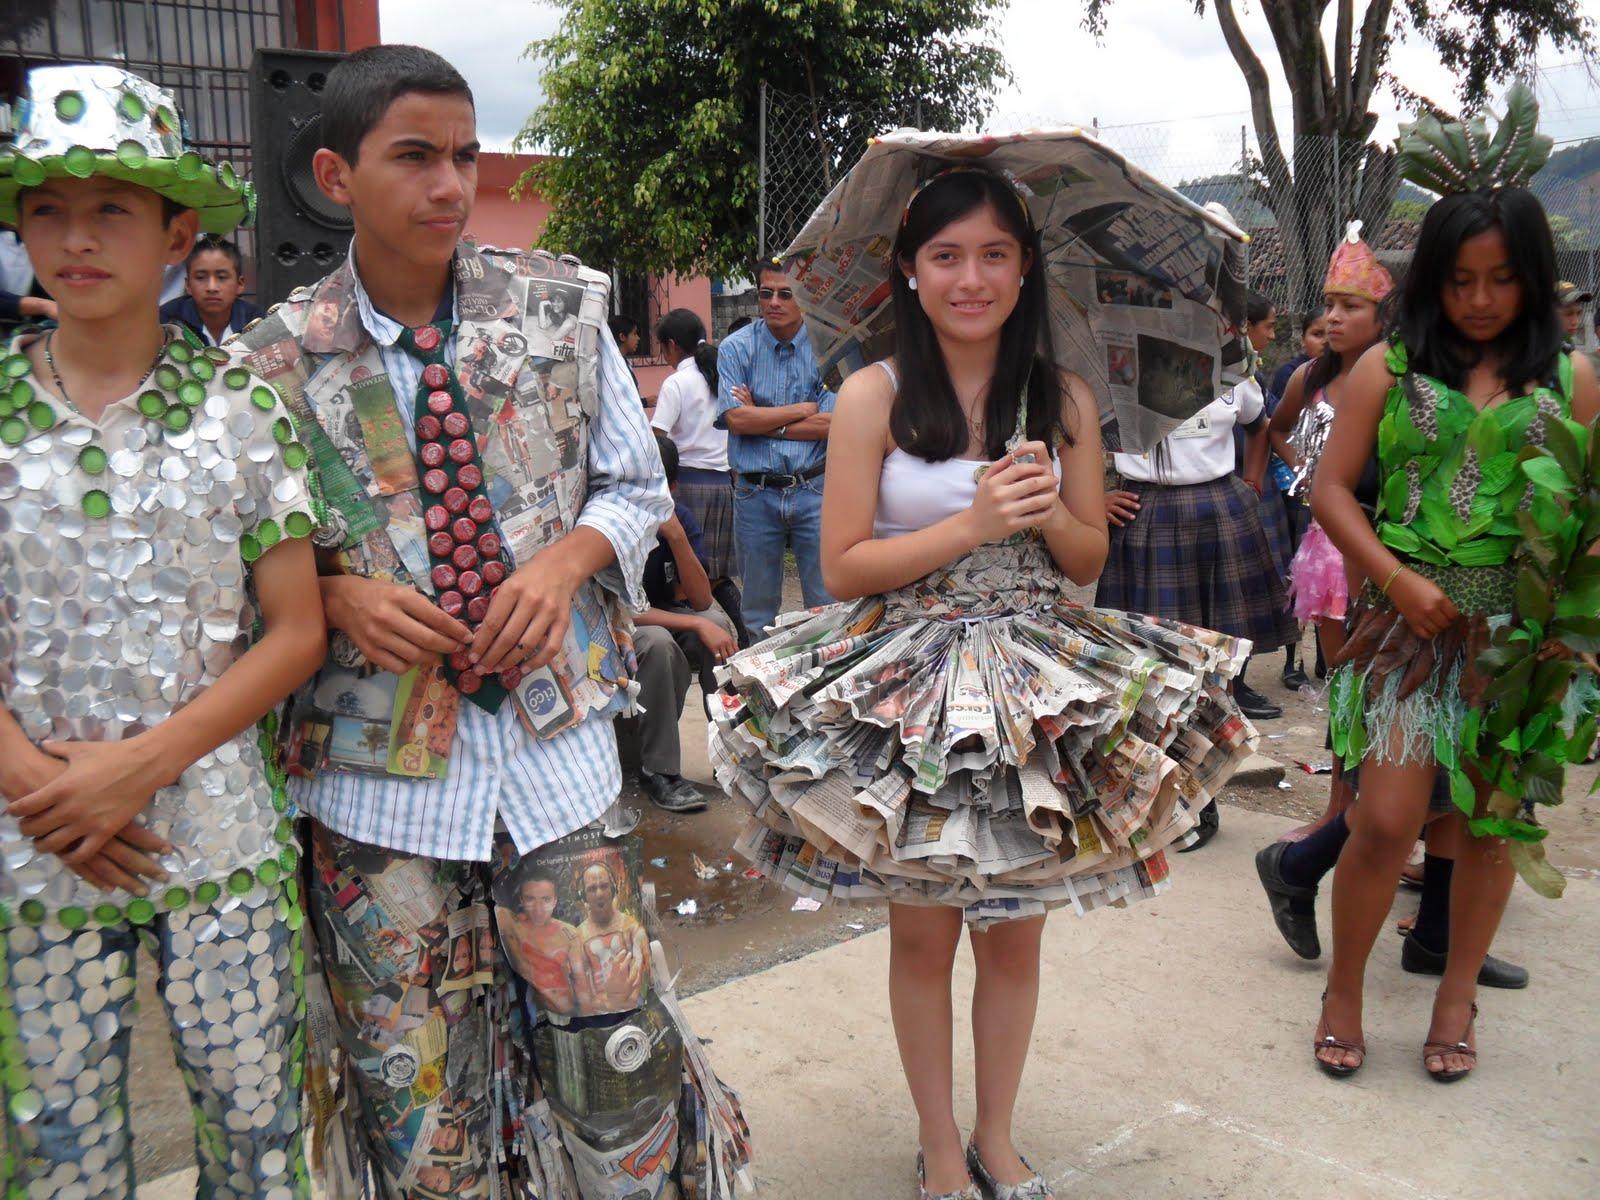 Trajes De Fantasia Con Material Reciclable | Black Hairstyle and